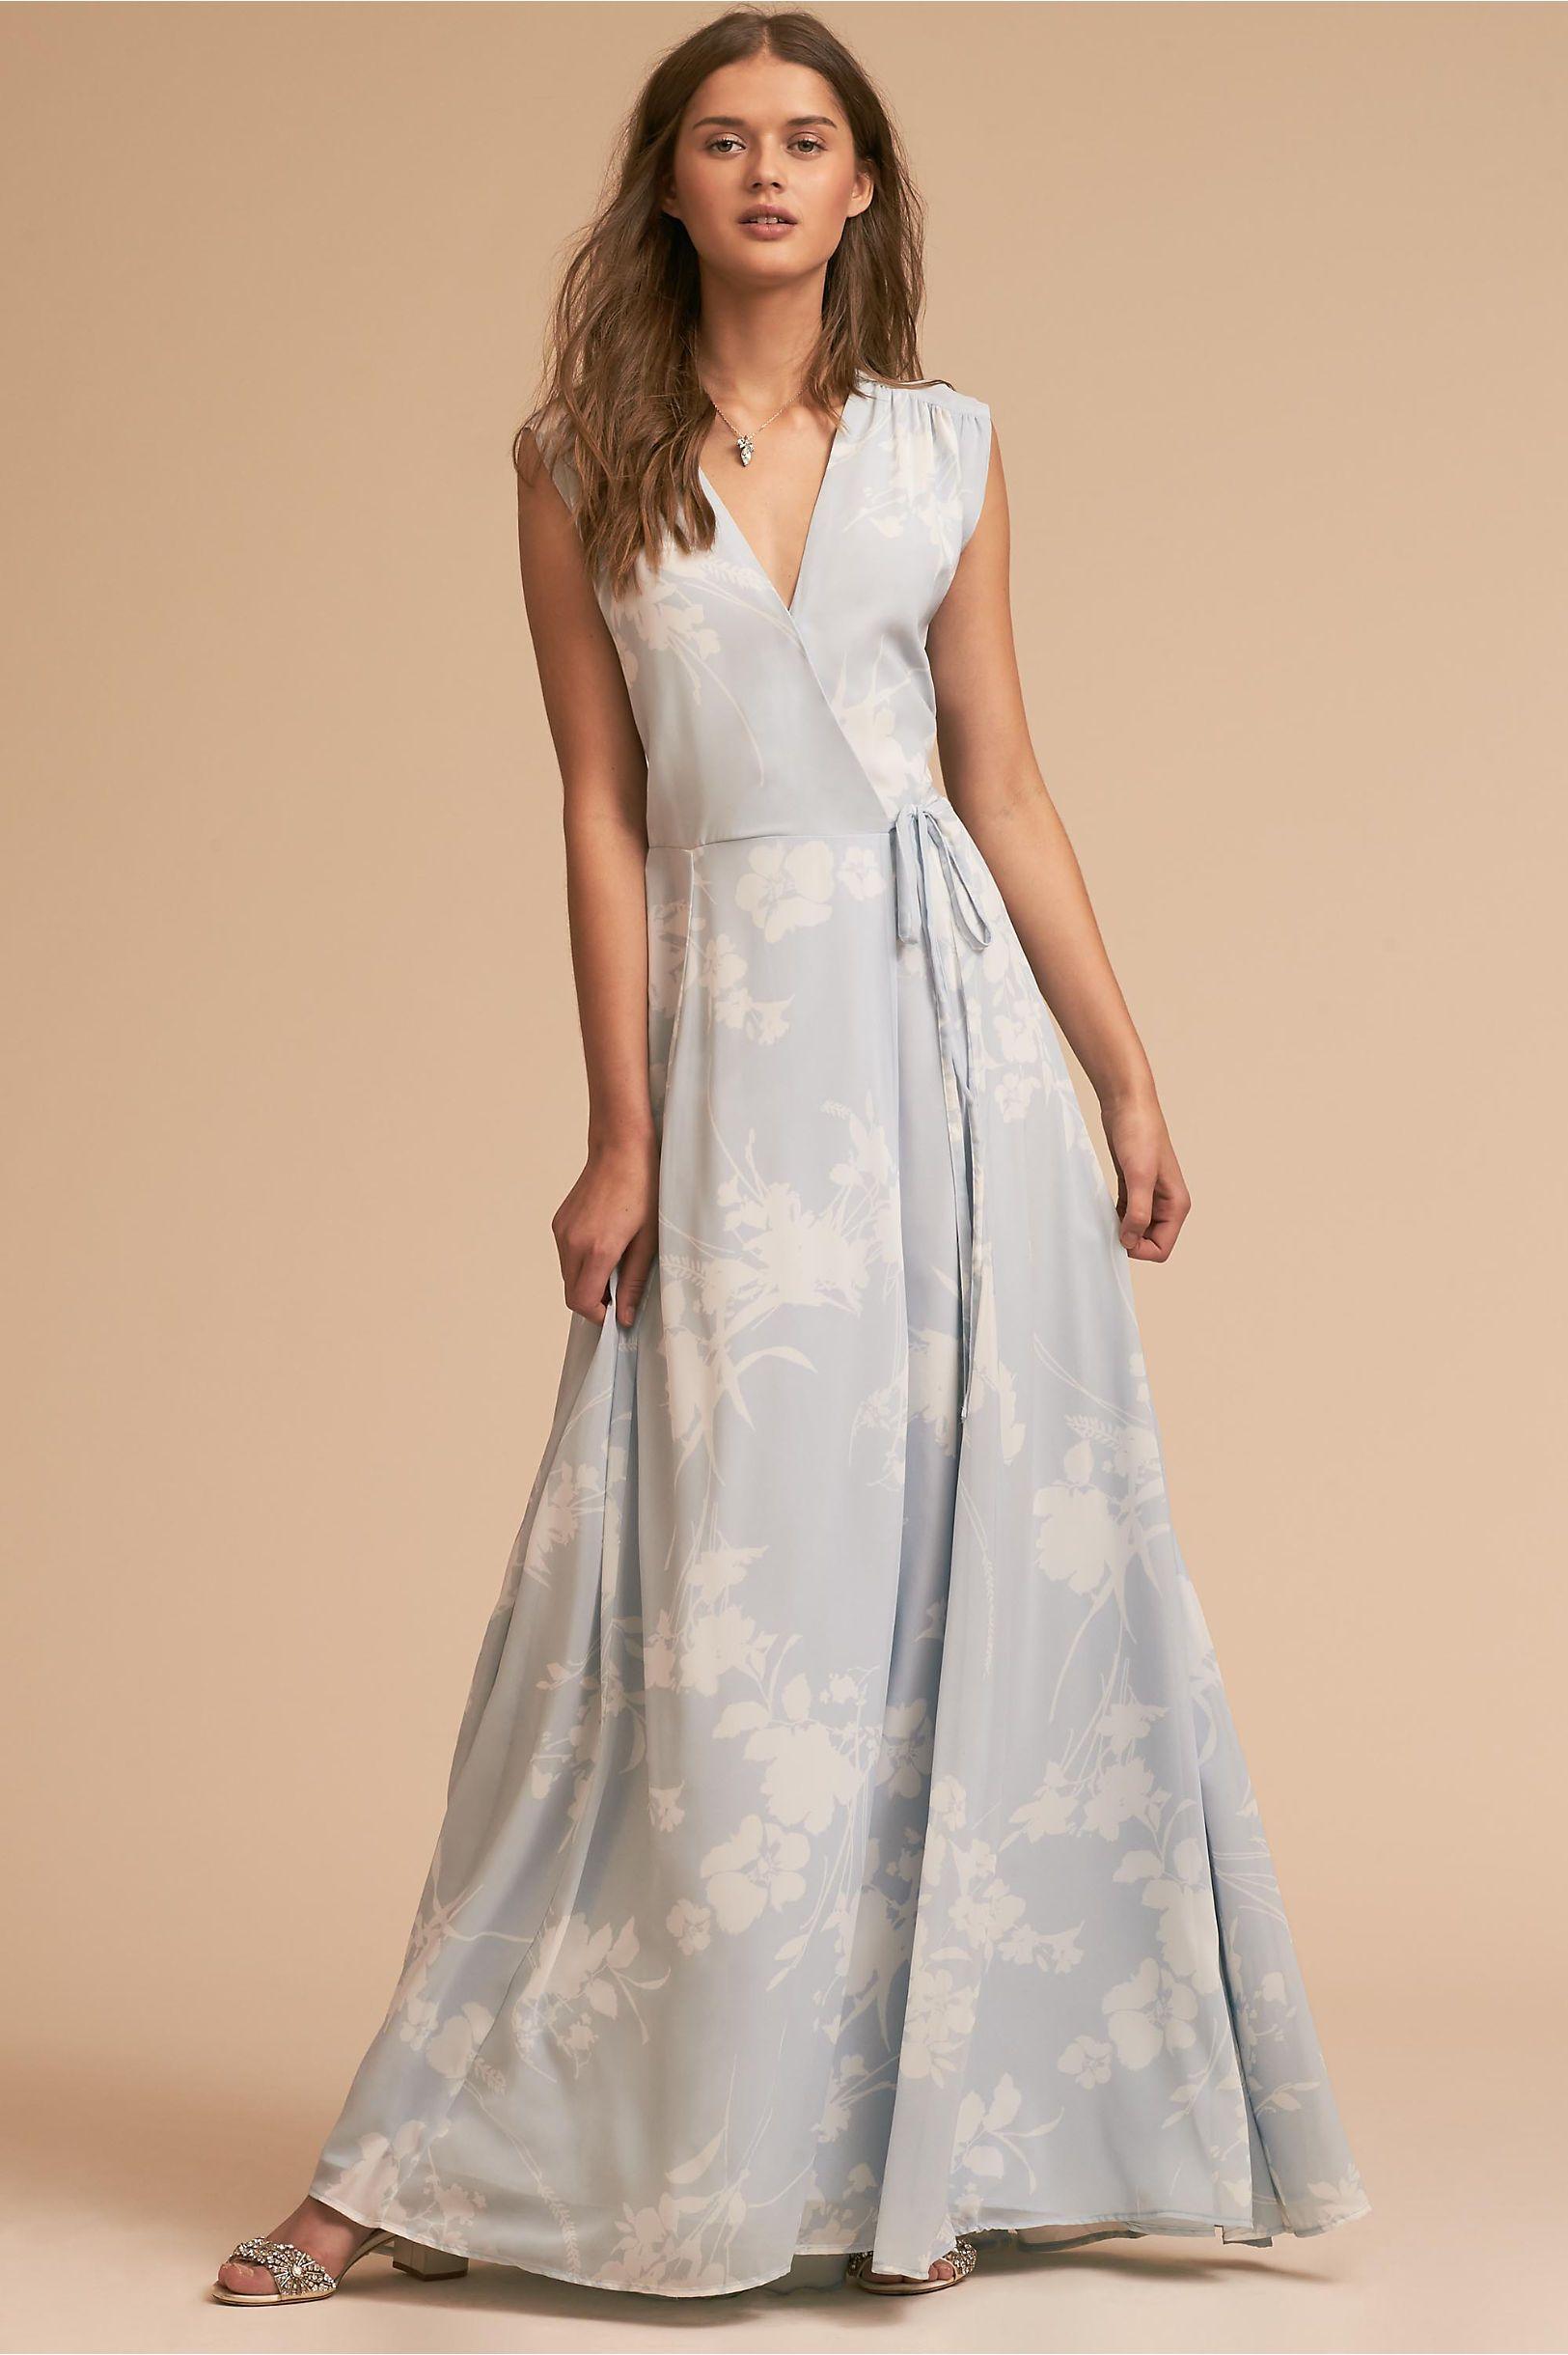 6881568abb9c Sashay Dress   Products   Bridesmaid dresses, Dresses, Blue ...